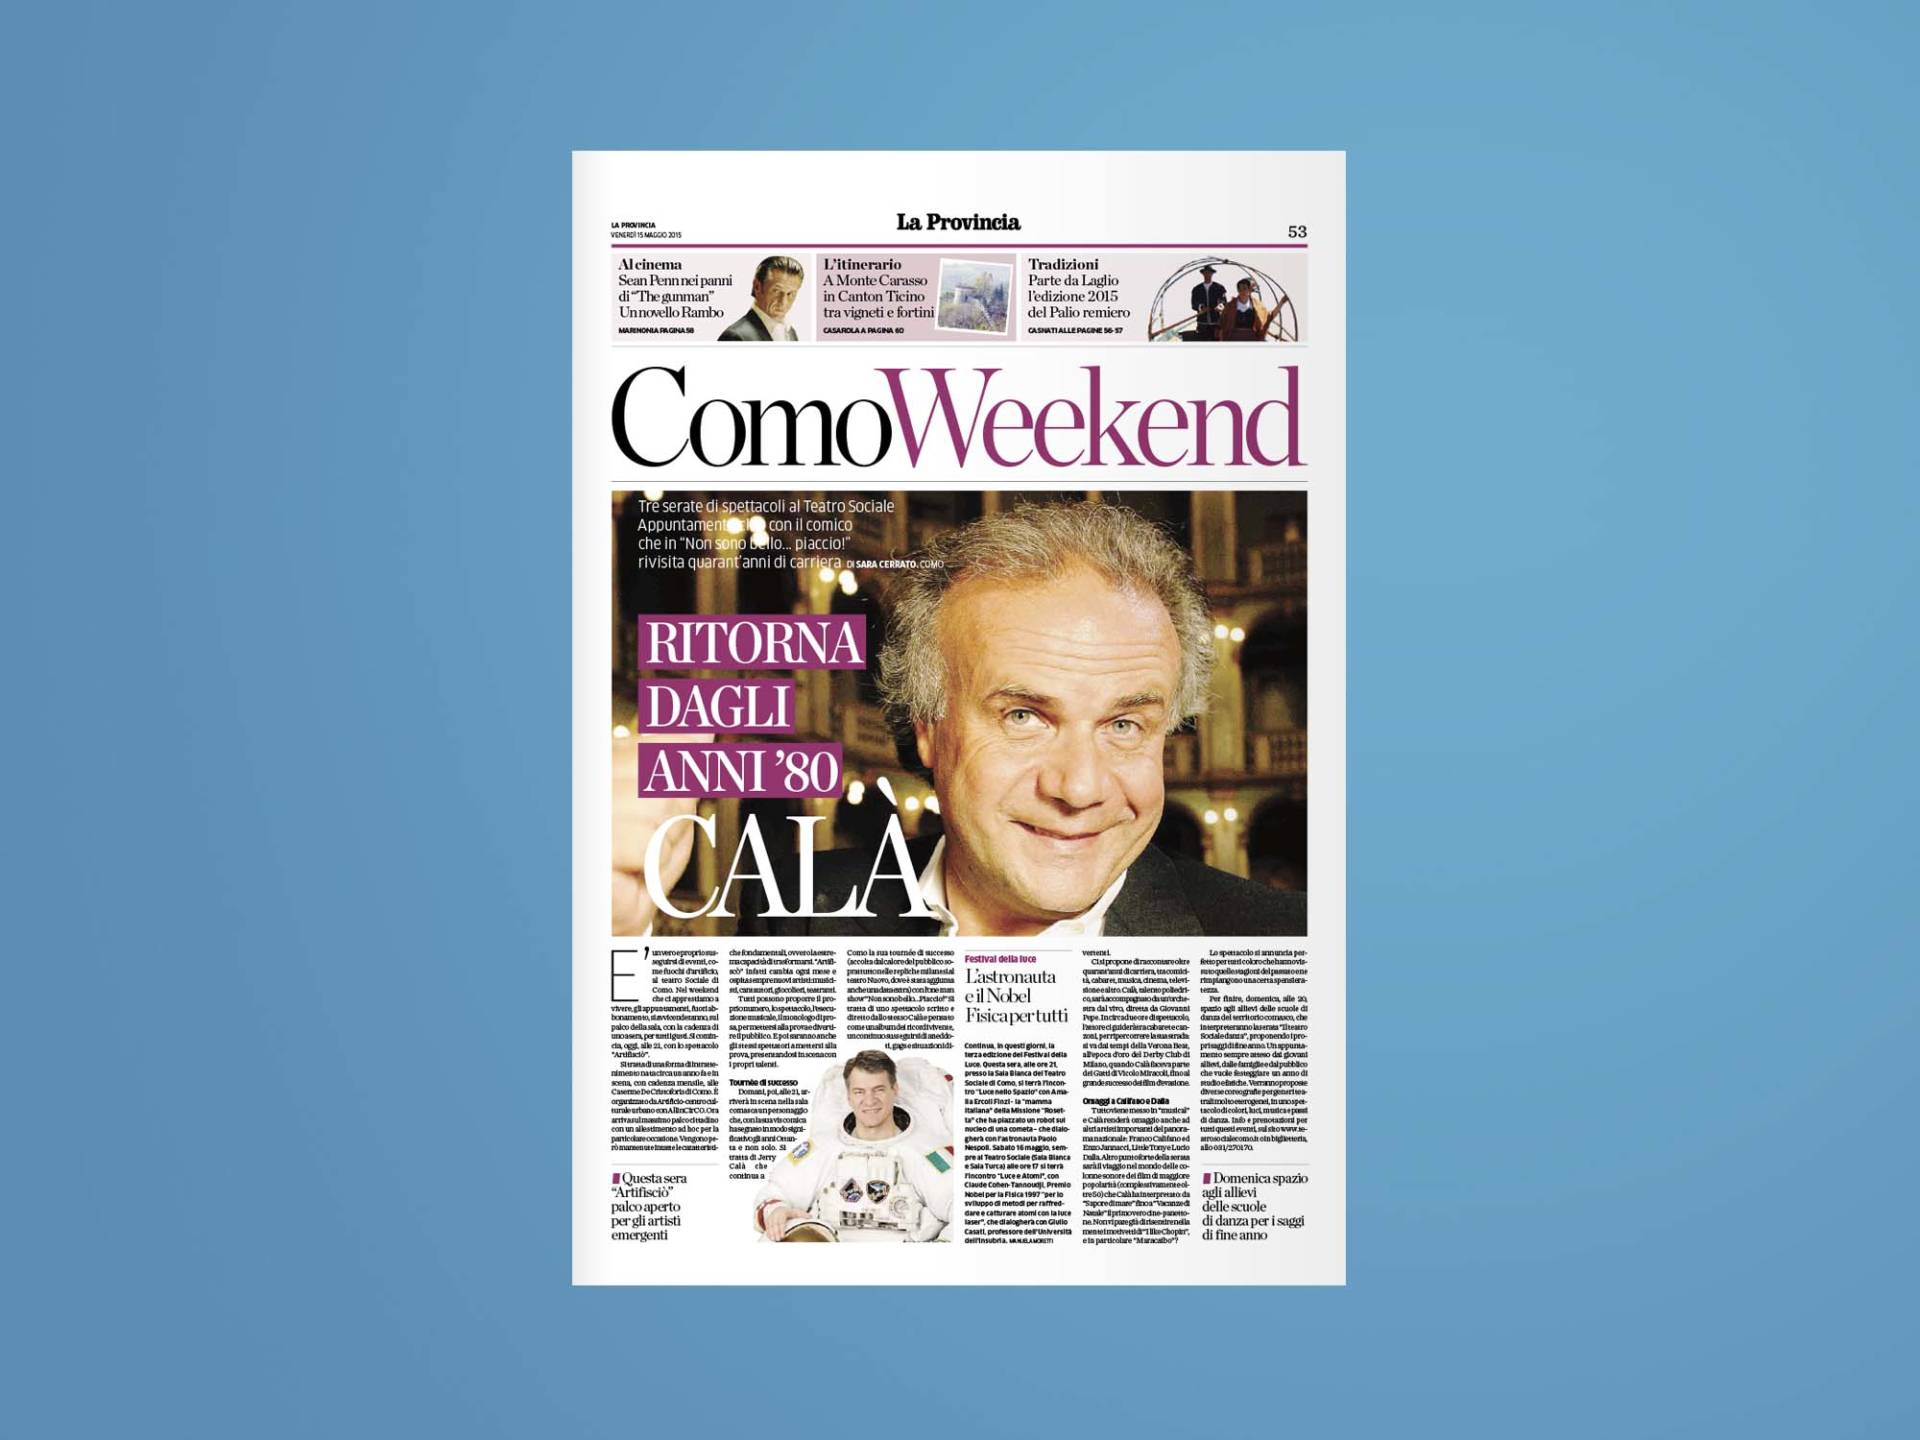 La_Provincia_09_Wenceslau_News_Design